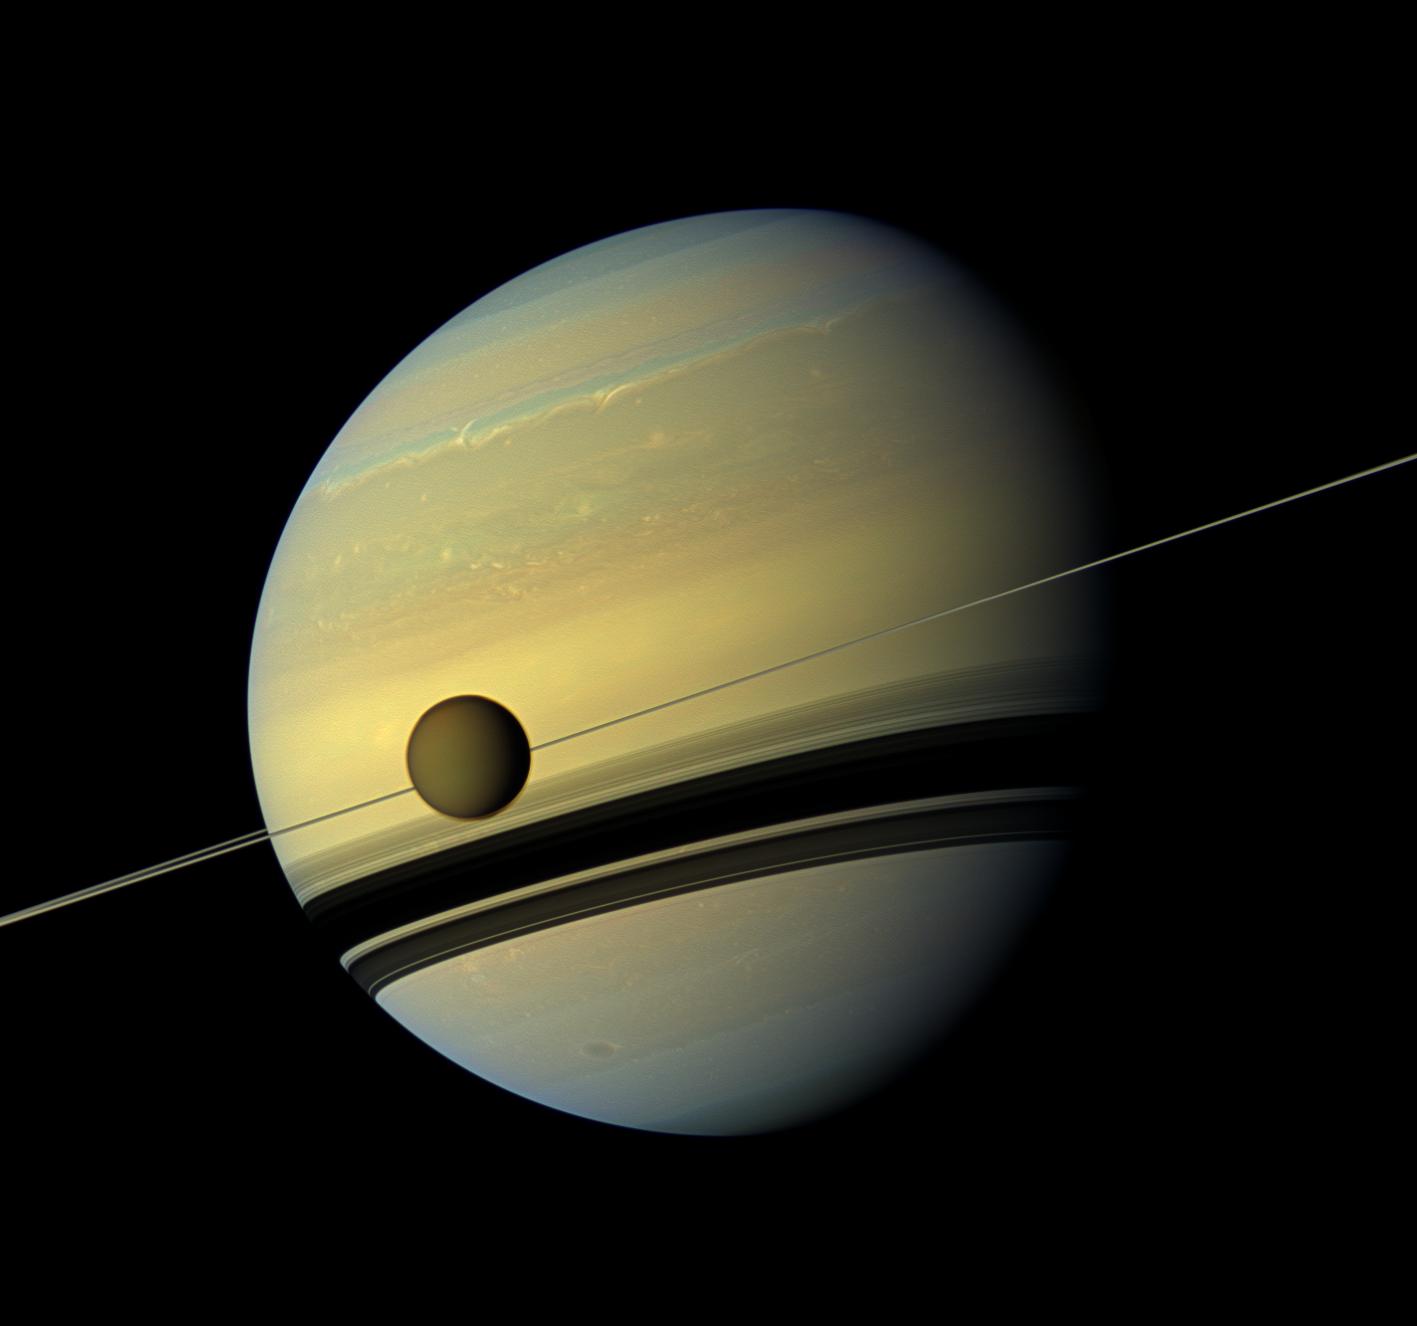 saturn probe - photo #1